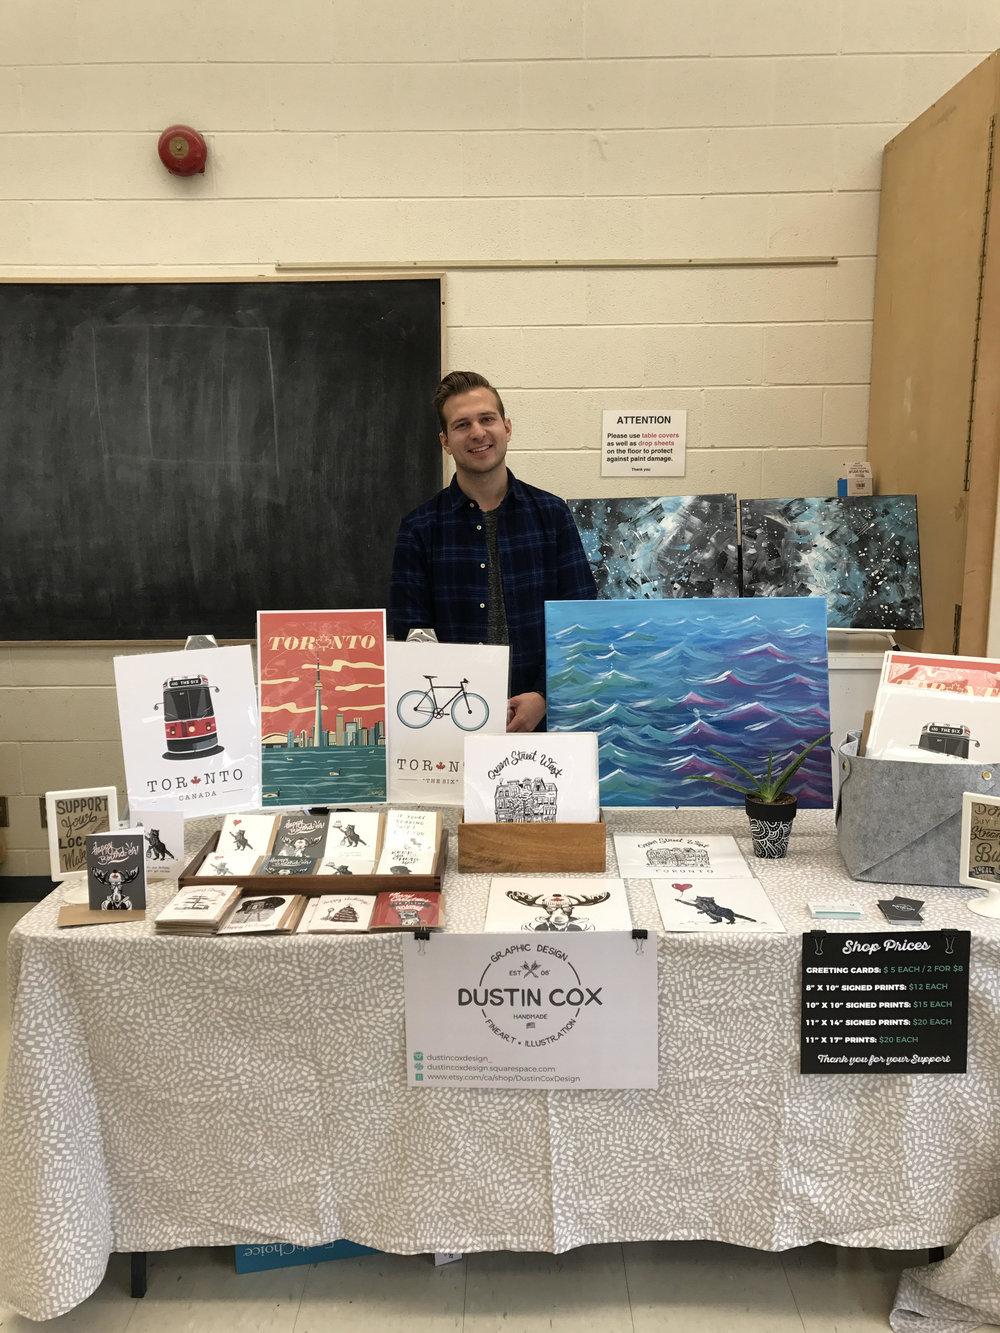 Neilson Park Handmade Craft Fair (April 8th, 2018)